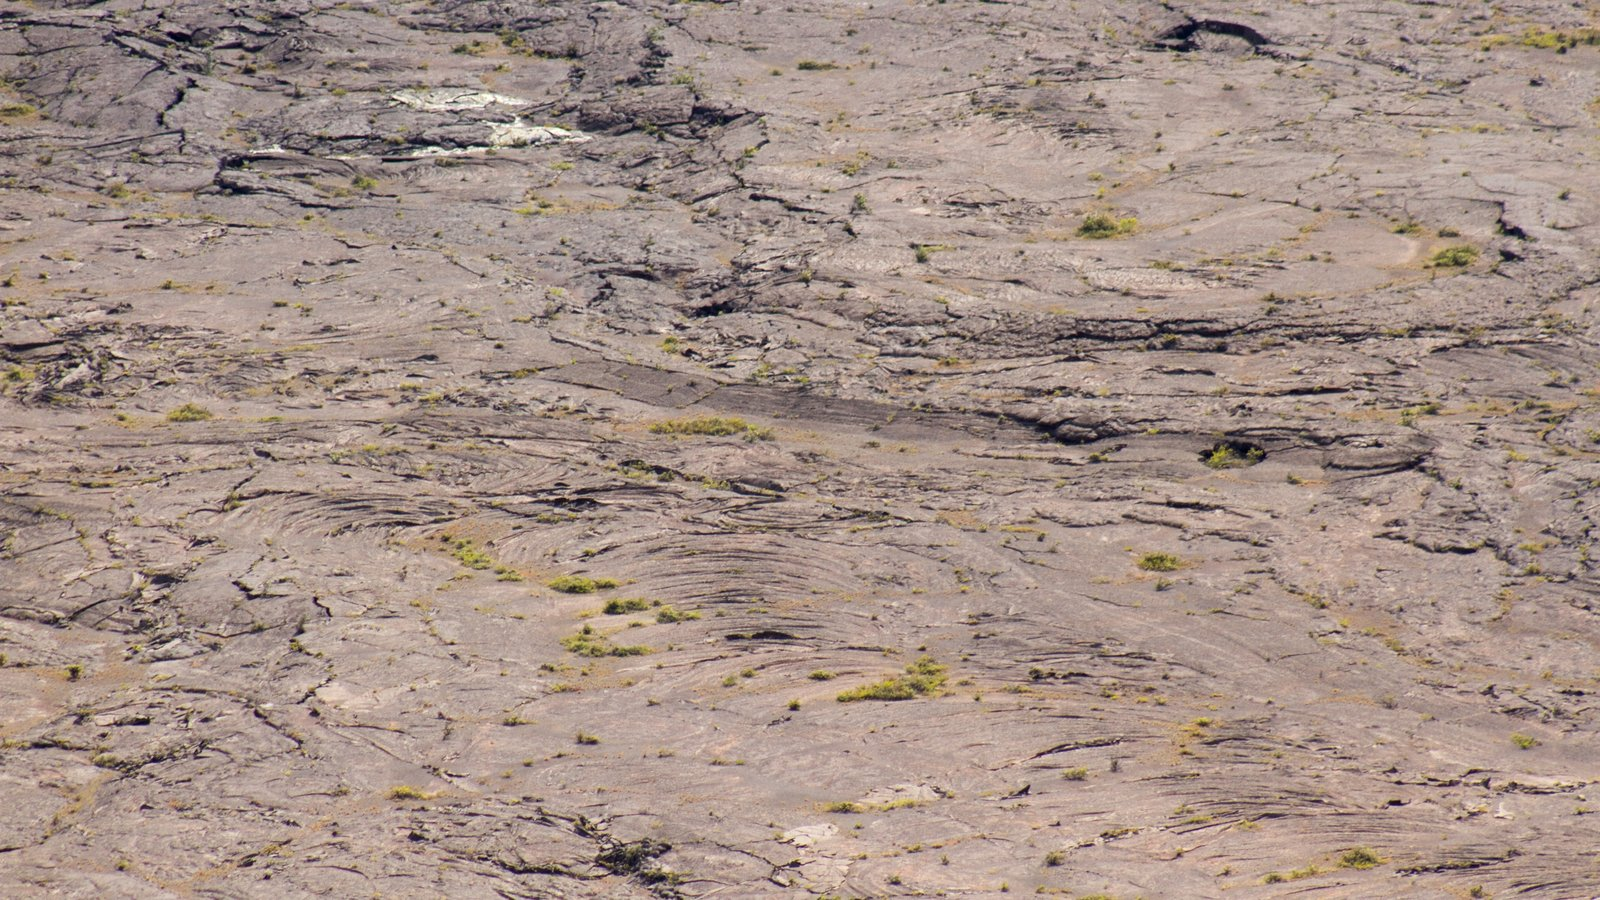 Hawaii Volcanoes National Park caracterizando paisagens do deserto